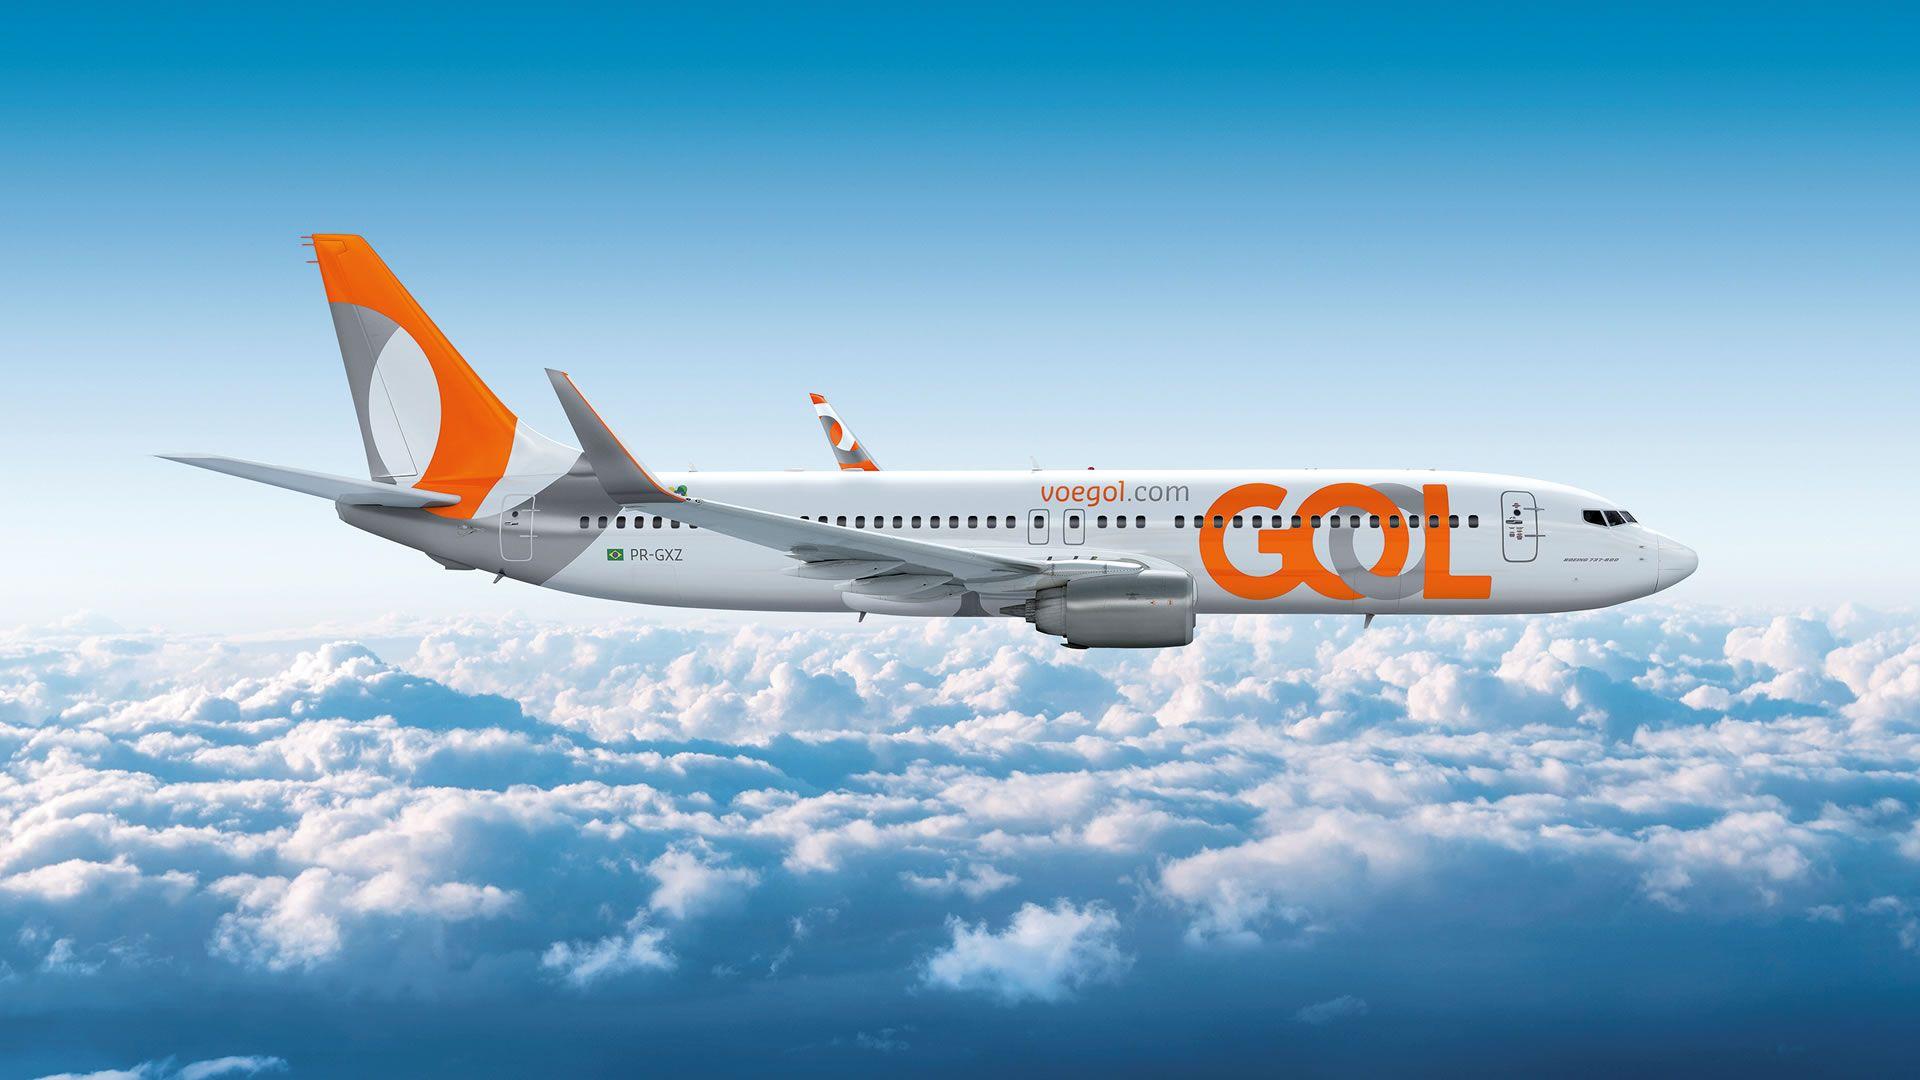 Gol comienza a operar vuelos directos de Brasil a Estados Unidos